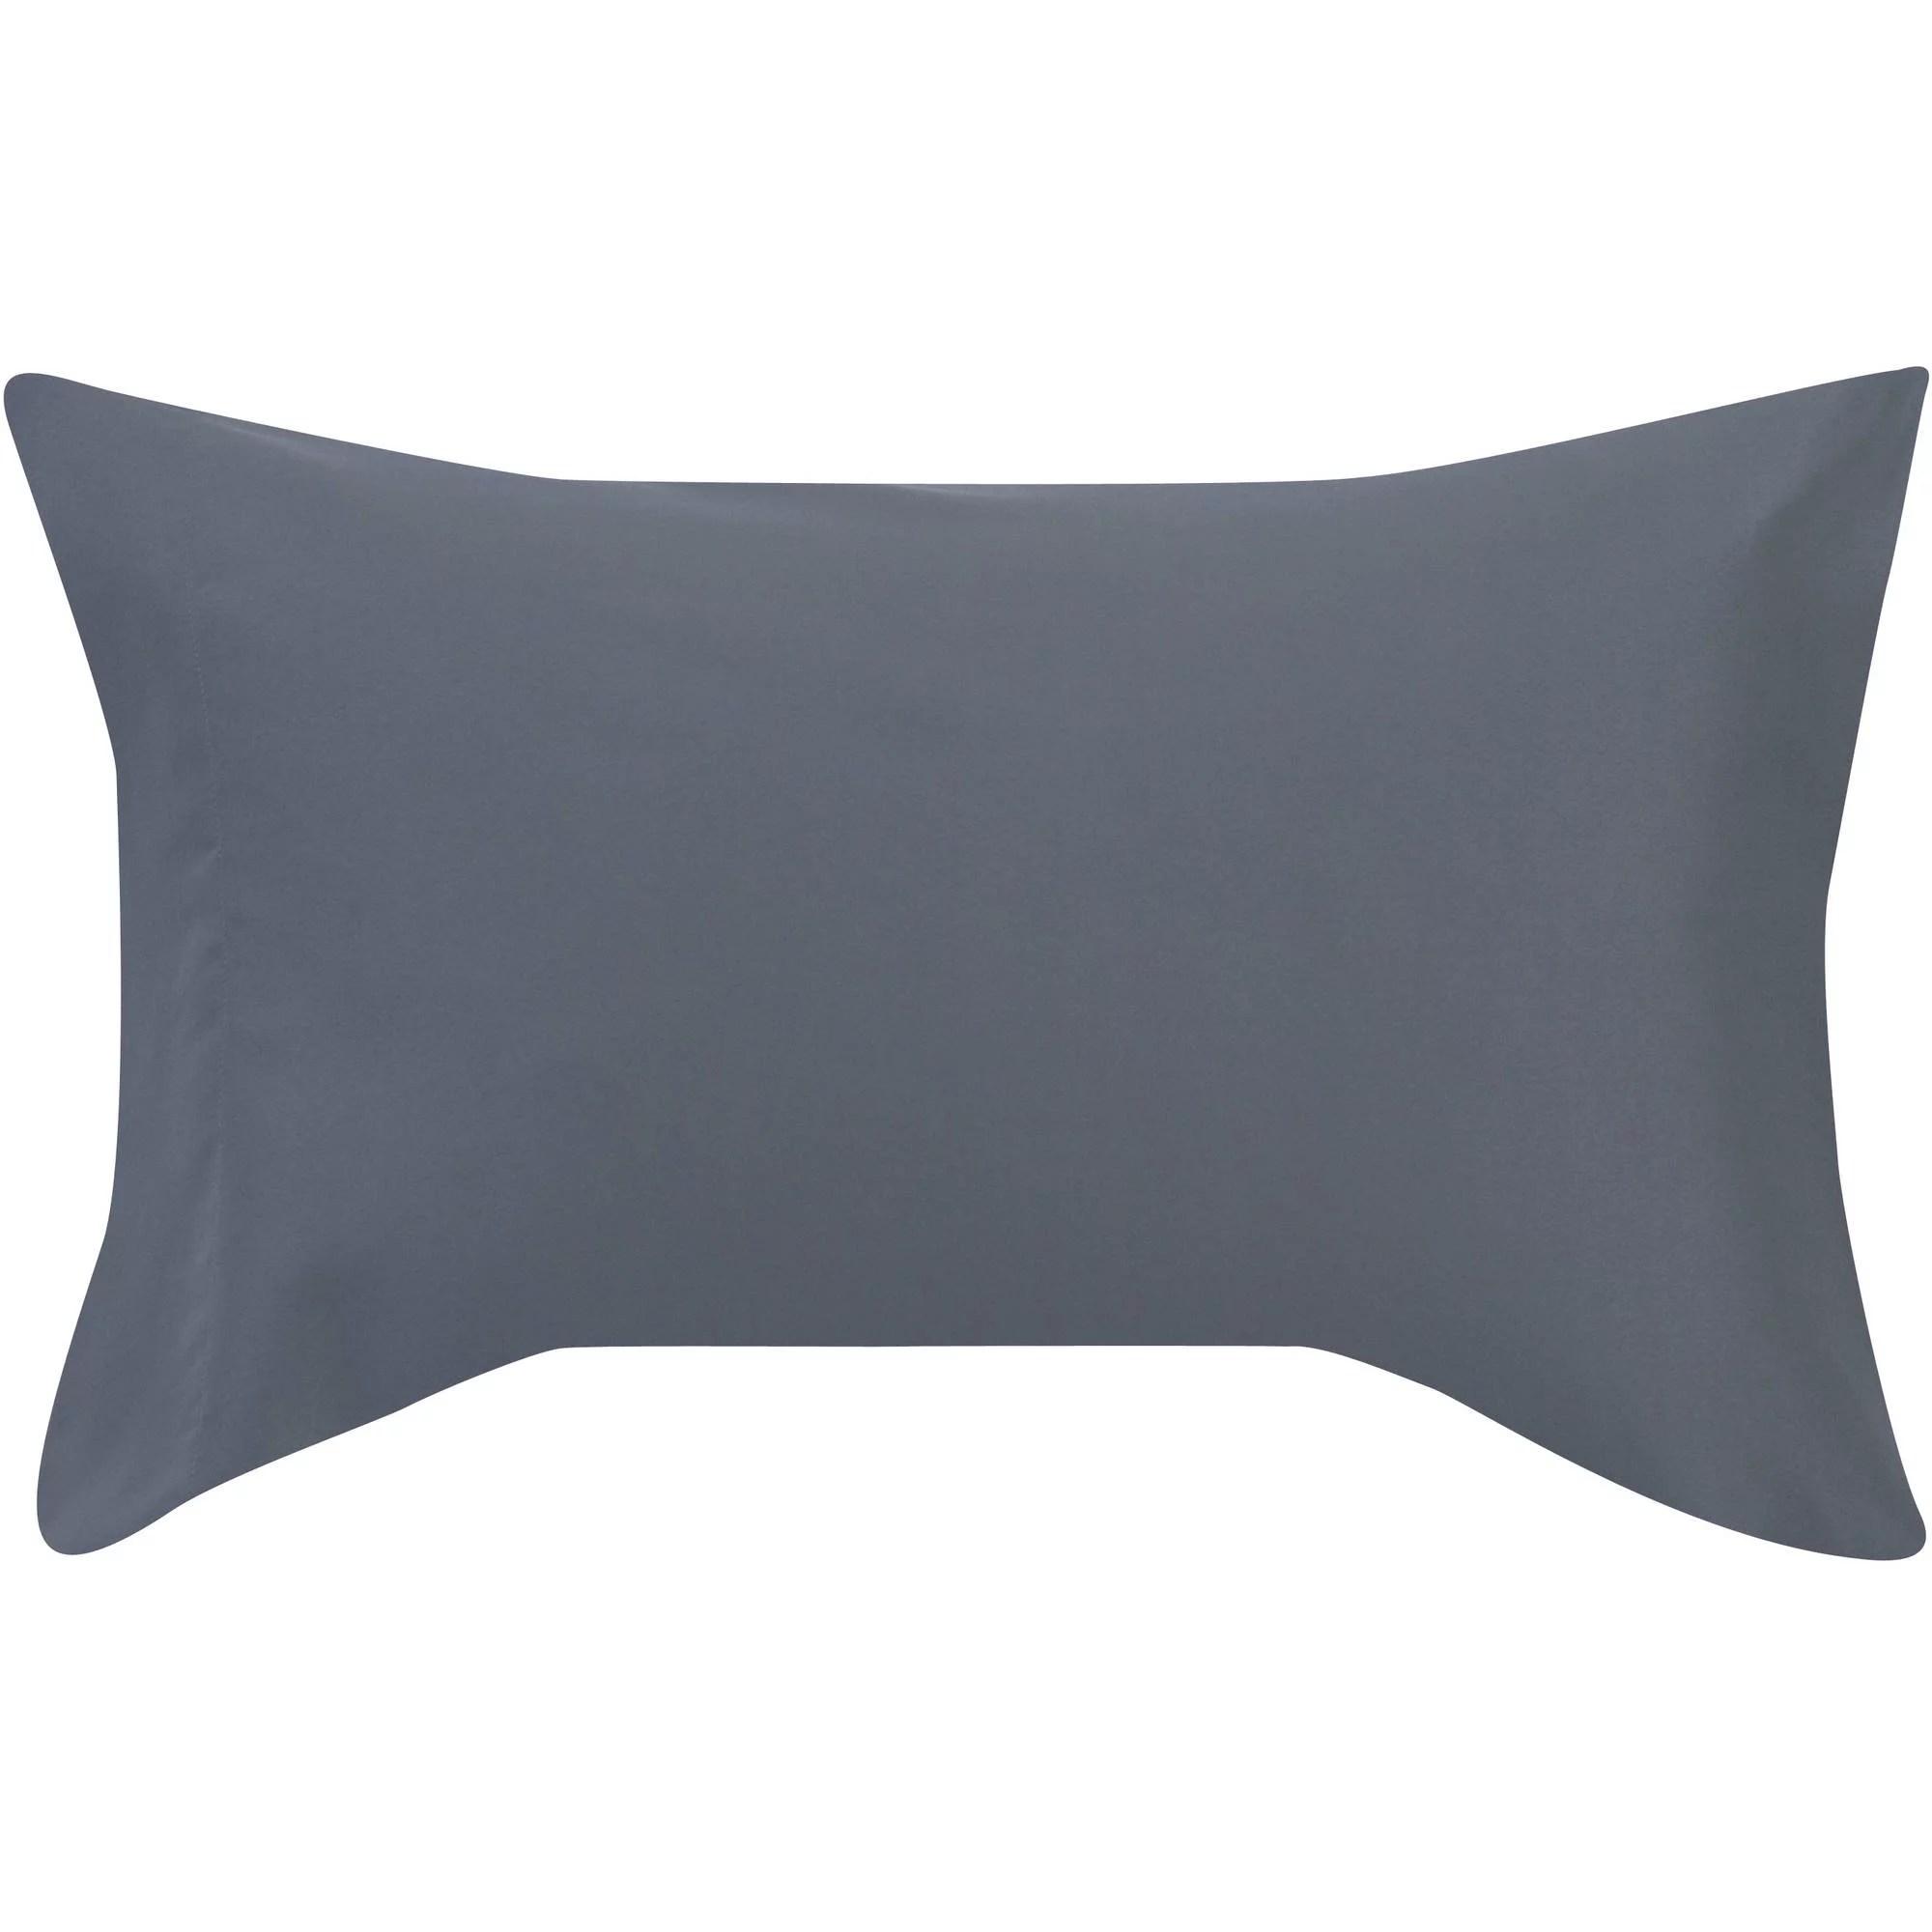 mainstays soft wrinkle resistant microfiber standard queen grey pillowcase set